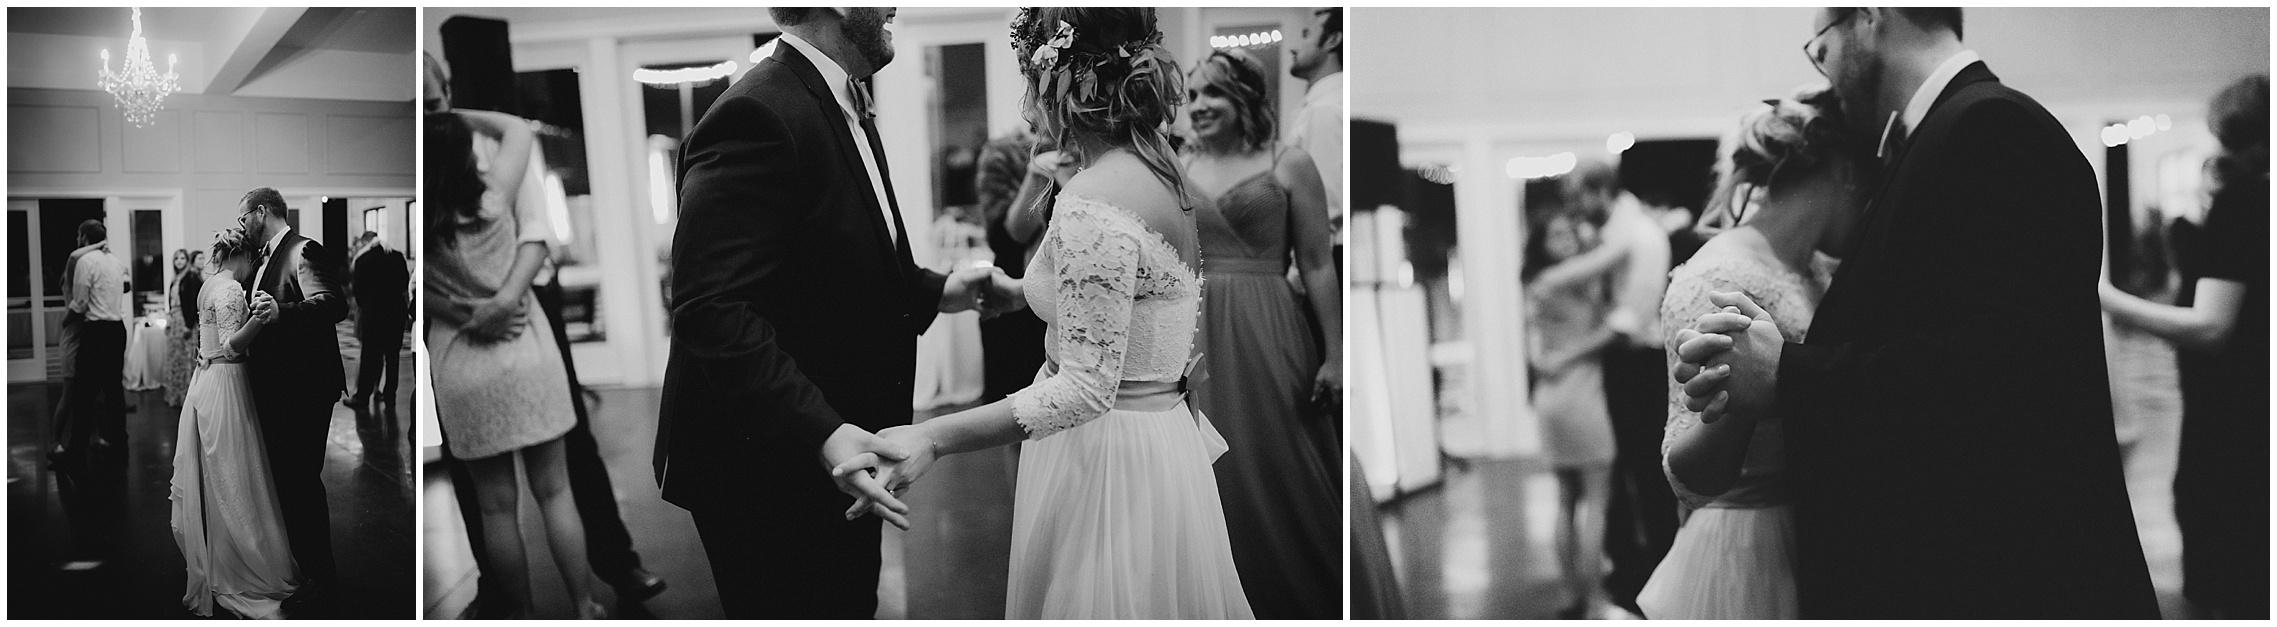 estes_park_wedding_colorado_photographer_0127.jpg